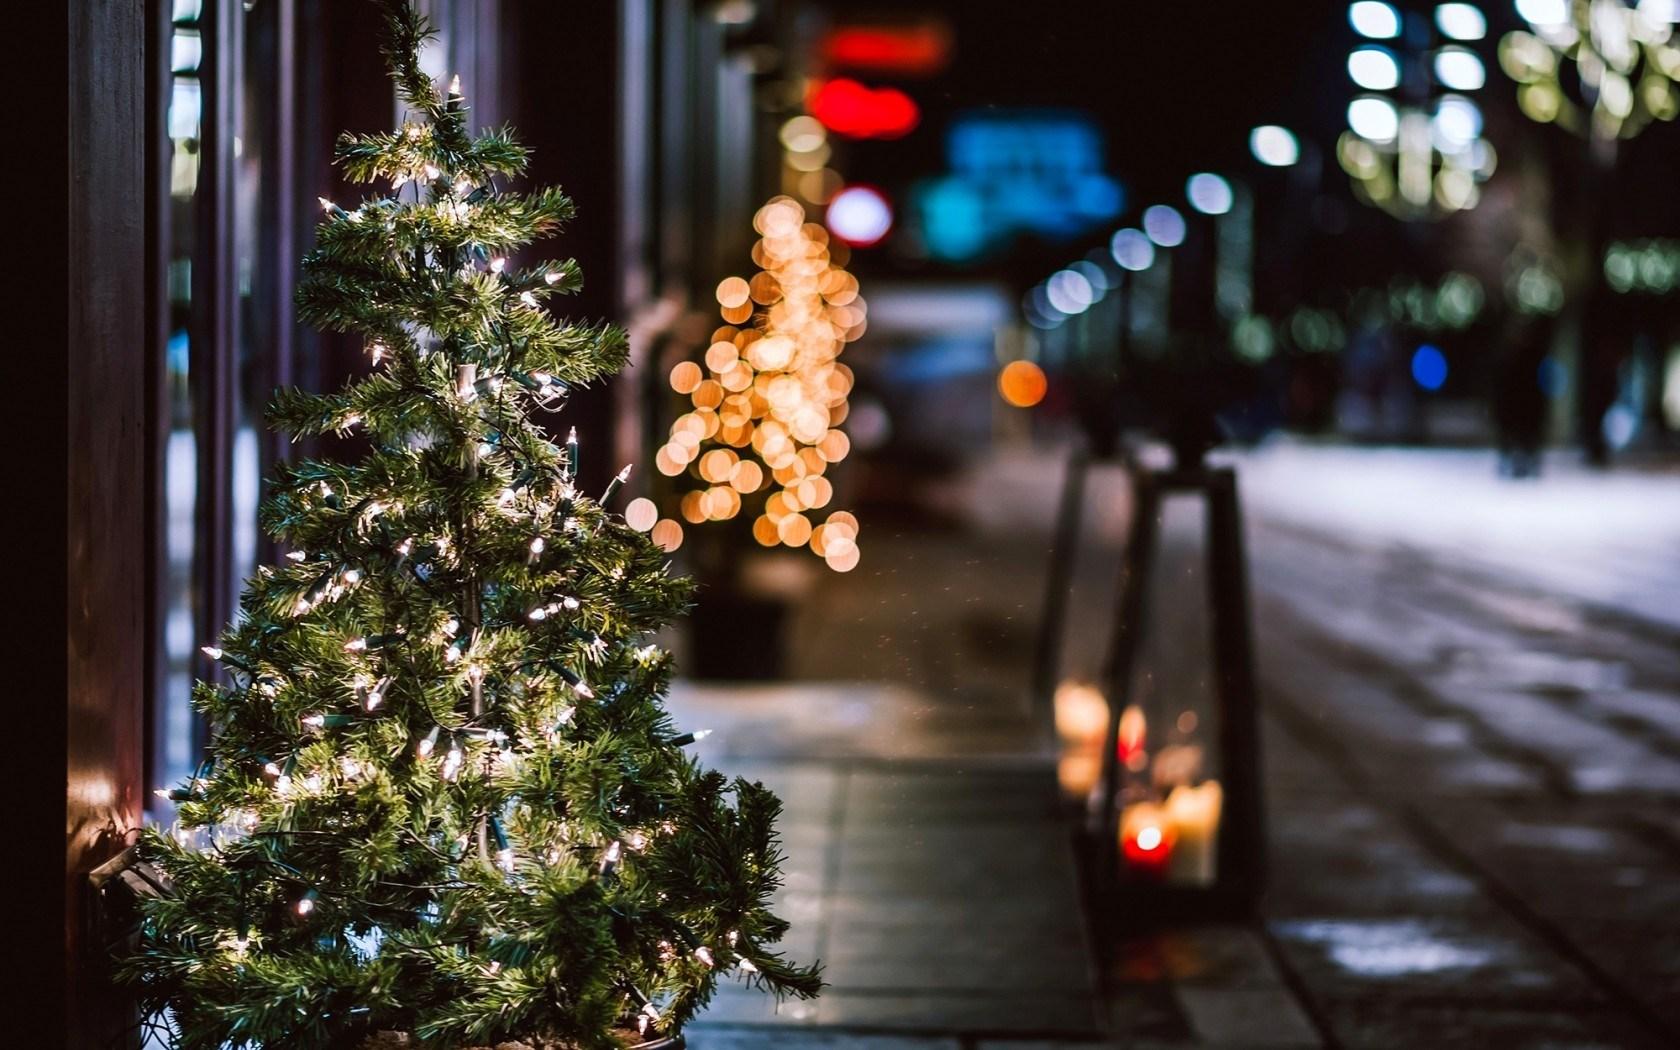 Christmas Tree Garland Lights City Street Night Winter Christmas Tree Wallpaper Ipad 1239101 Hd Wallpaper Backgrounds Download